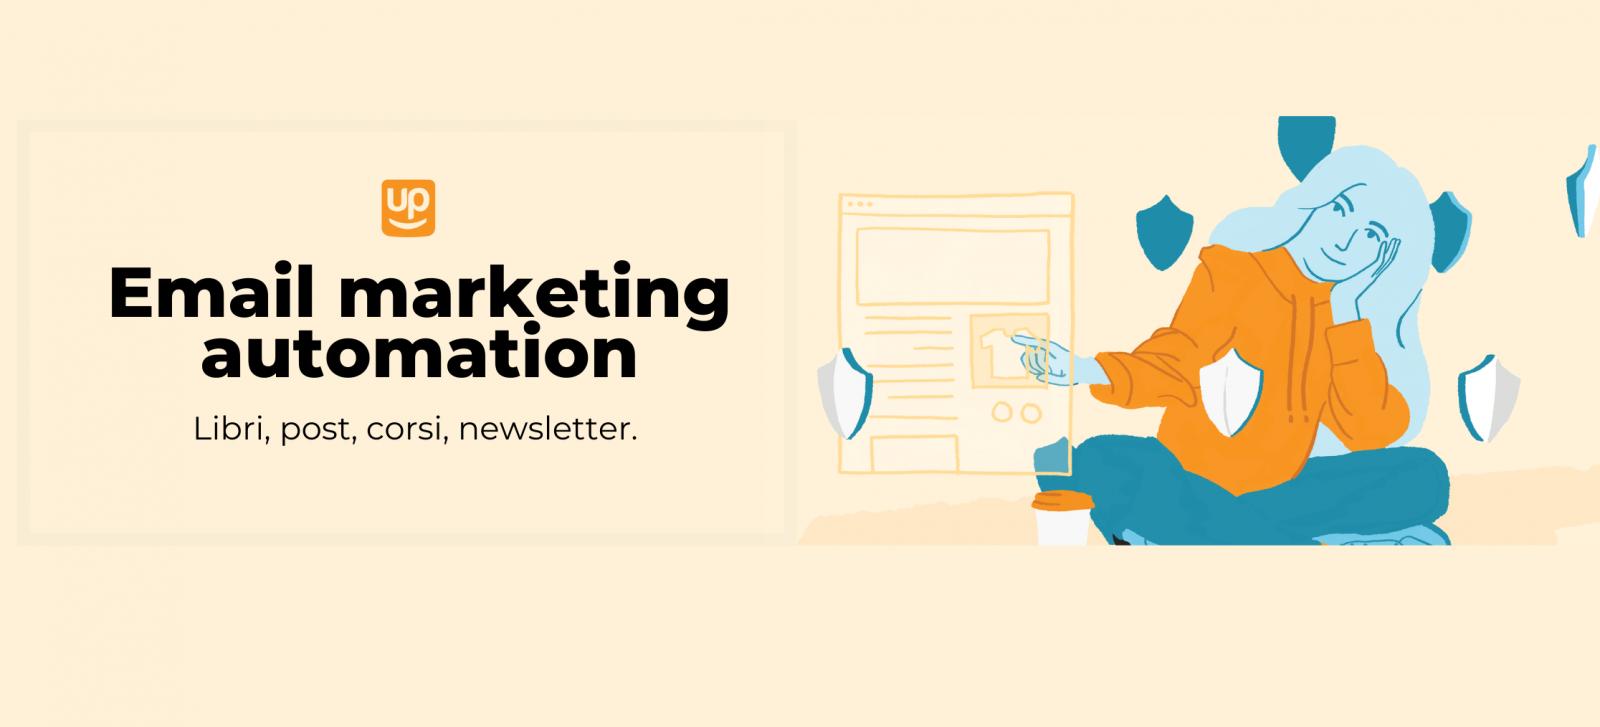 bibliografia email marketing automation